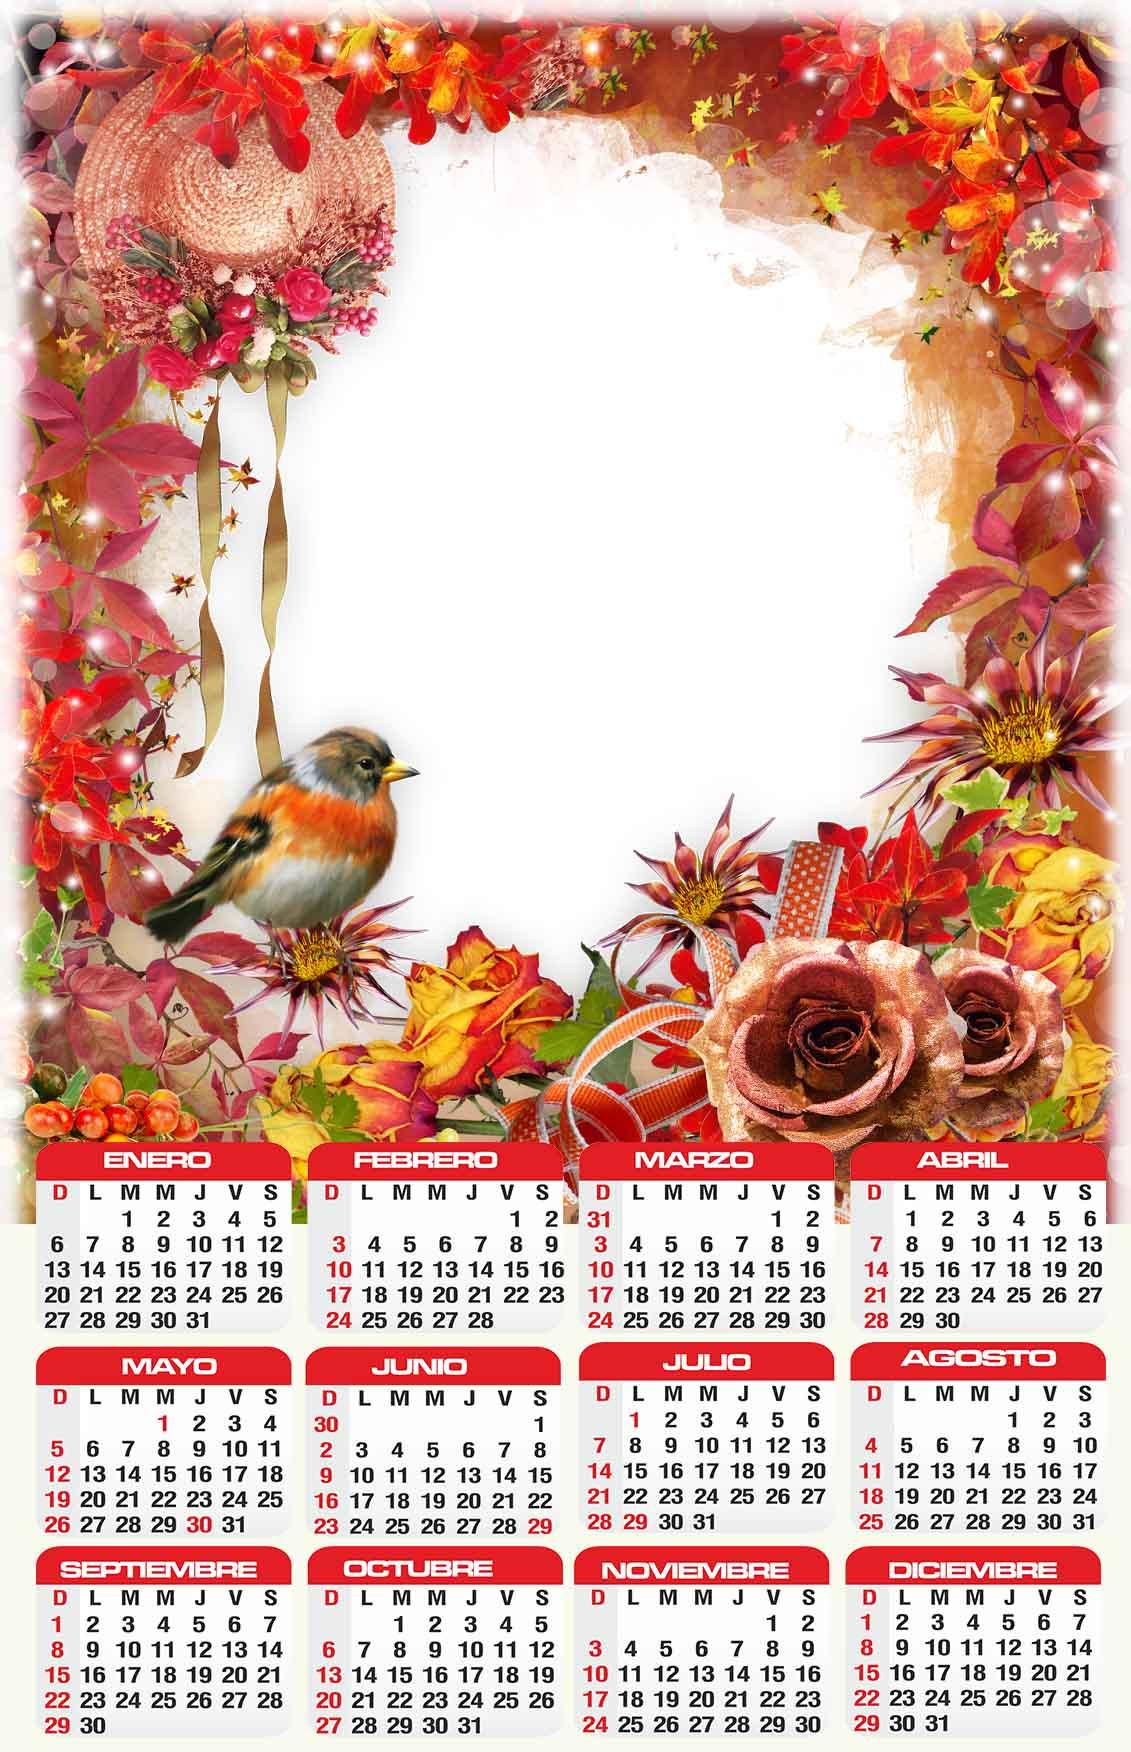 calendario 2019 editables para imprimir gratis psd